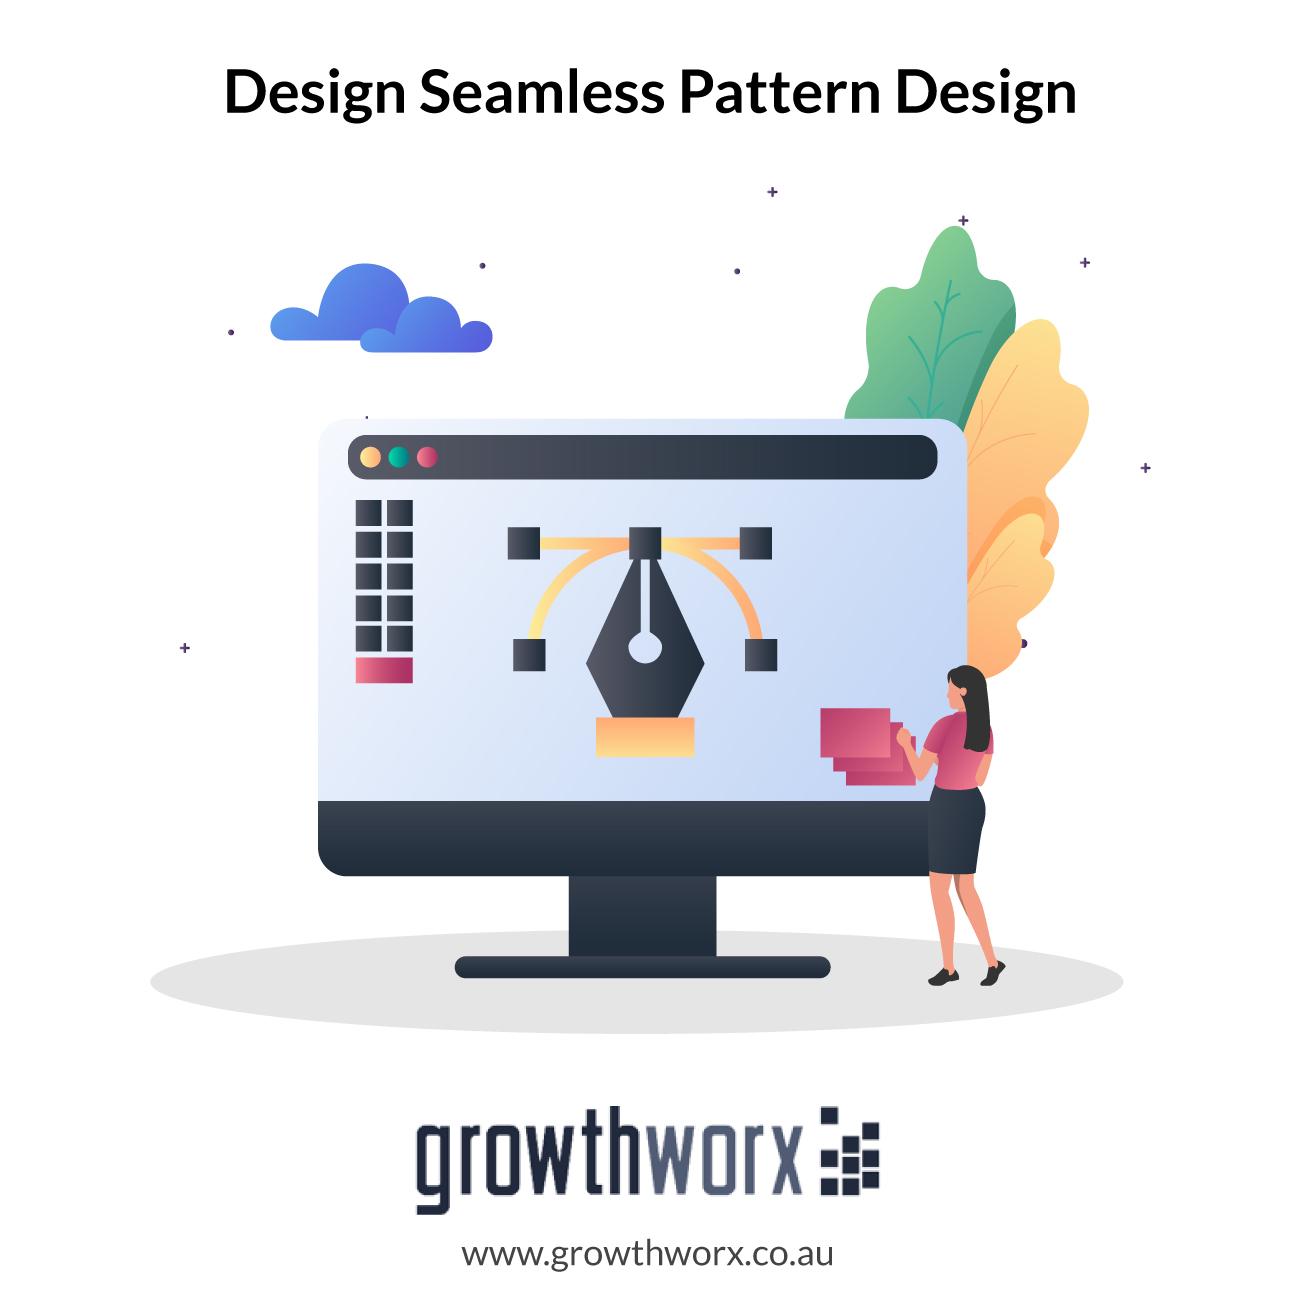 Design seamless repeat textile prints pattern design 1